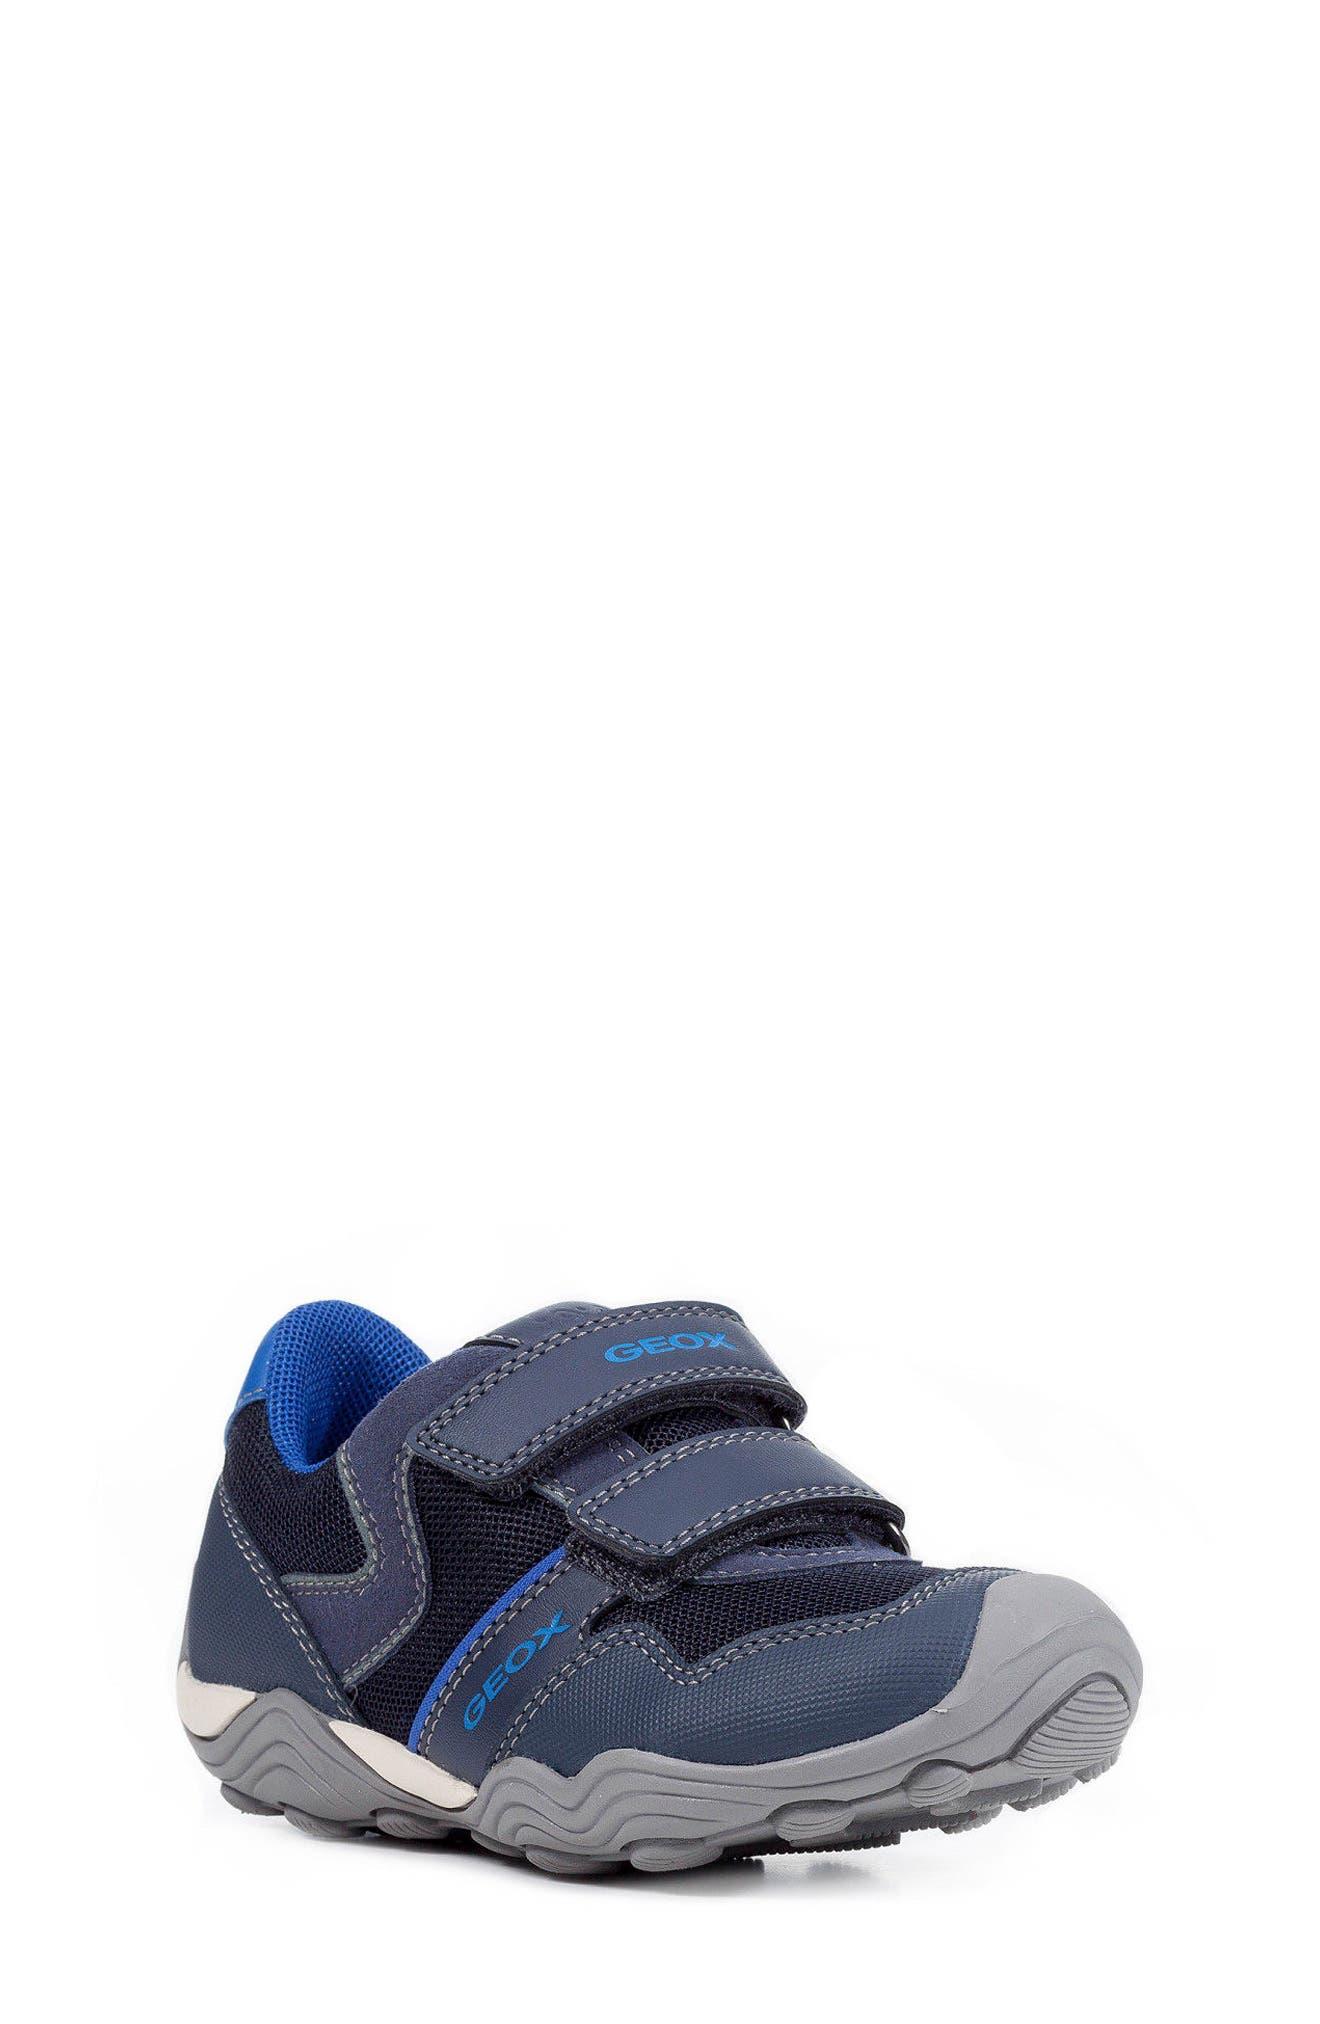 Jr Arno 13 Sneaker,                         Main,                         color, Navy/ Royal Blue